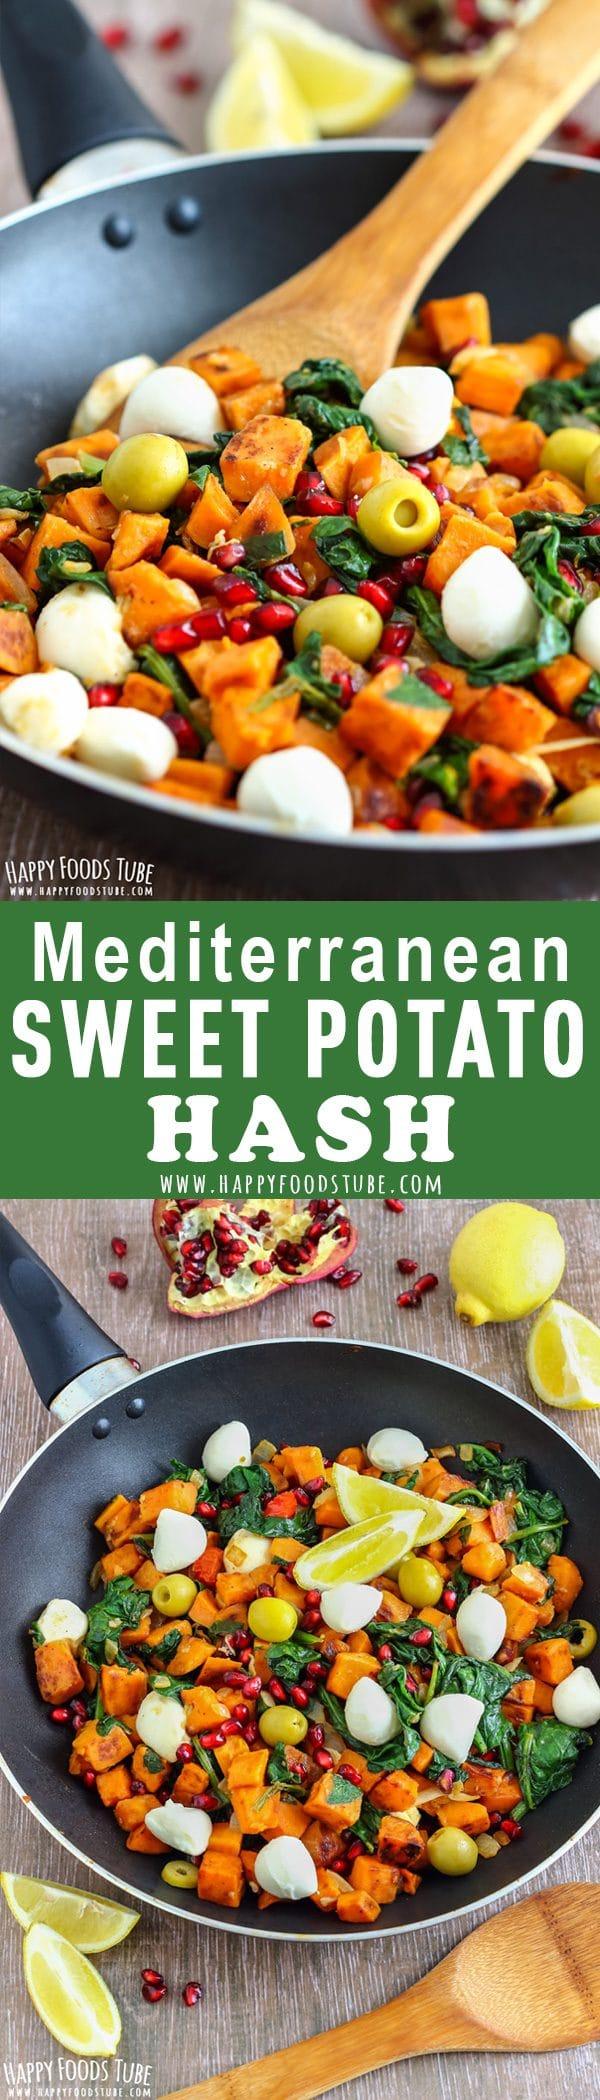 Mediterranean Sweet Potato Hash Recipe Picture